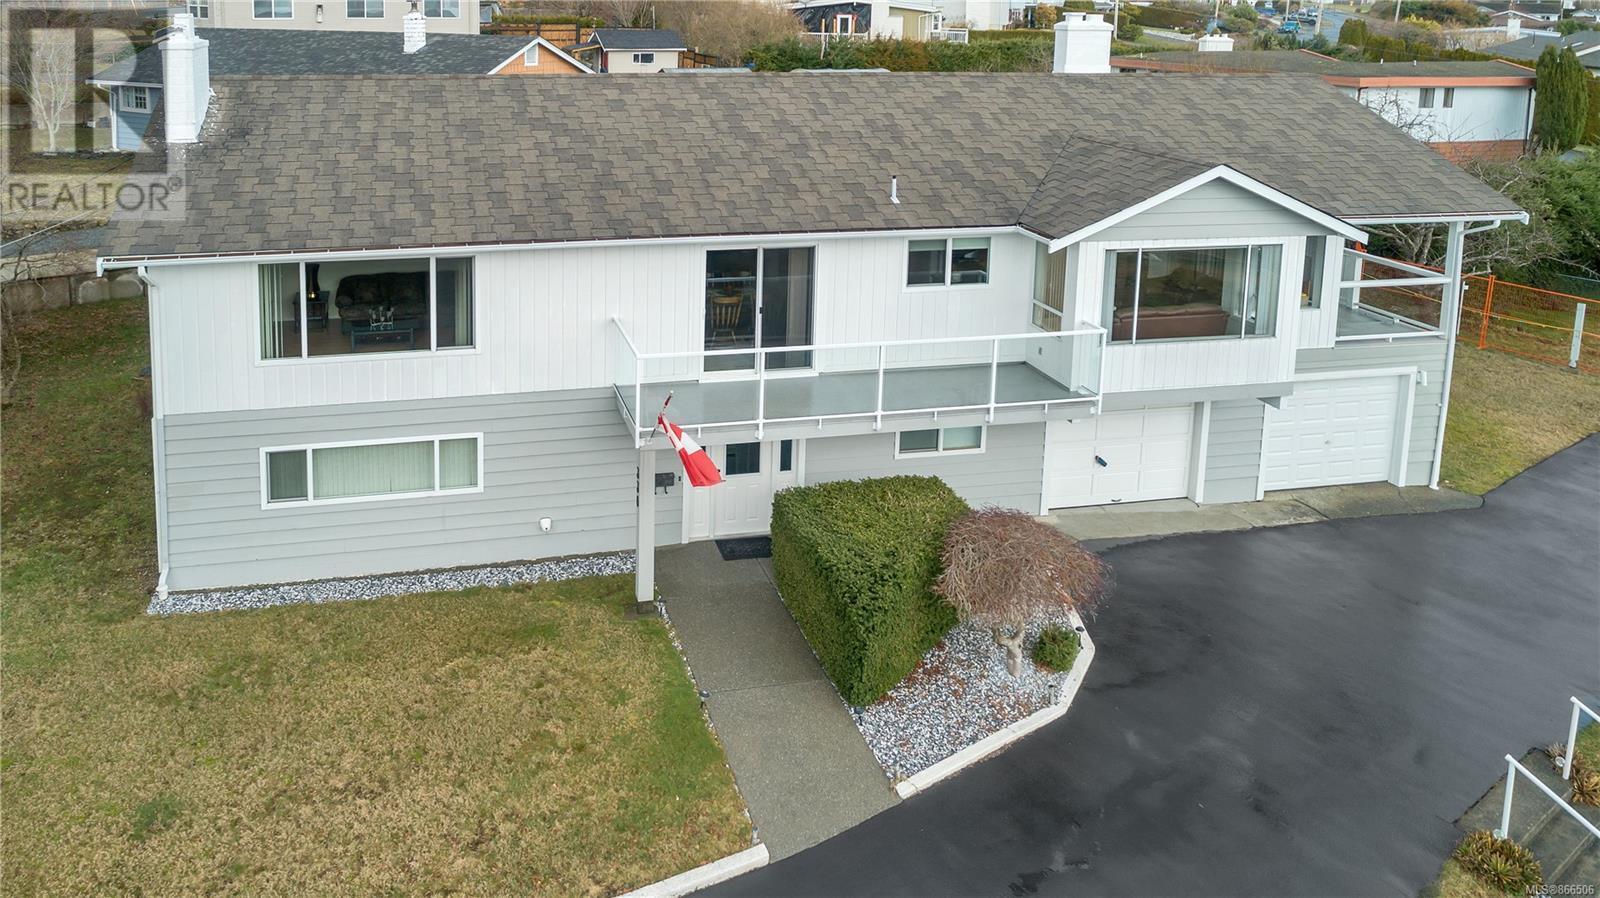 330 Niluht Rd, Campbell River, British Columbia  V9W 1W8 - Photo 2 - 866506